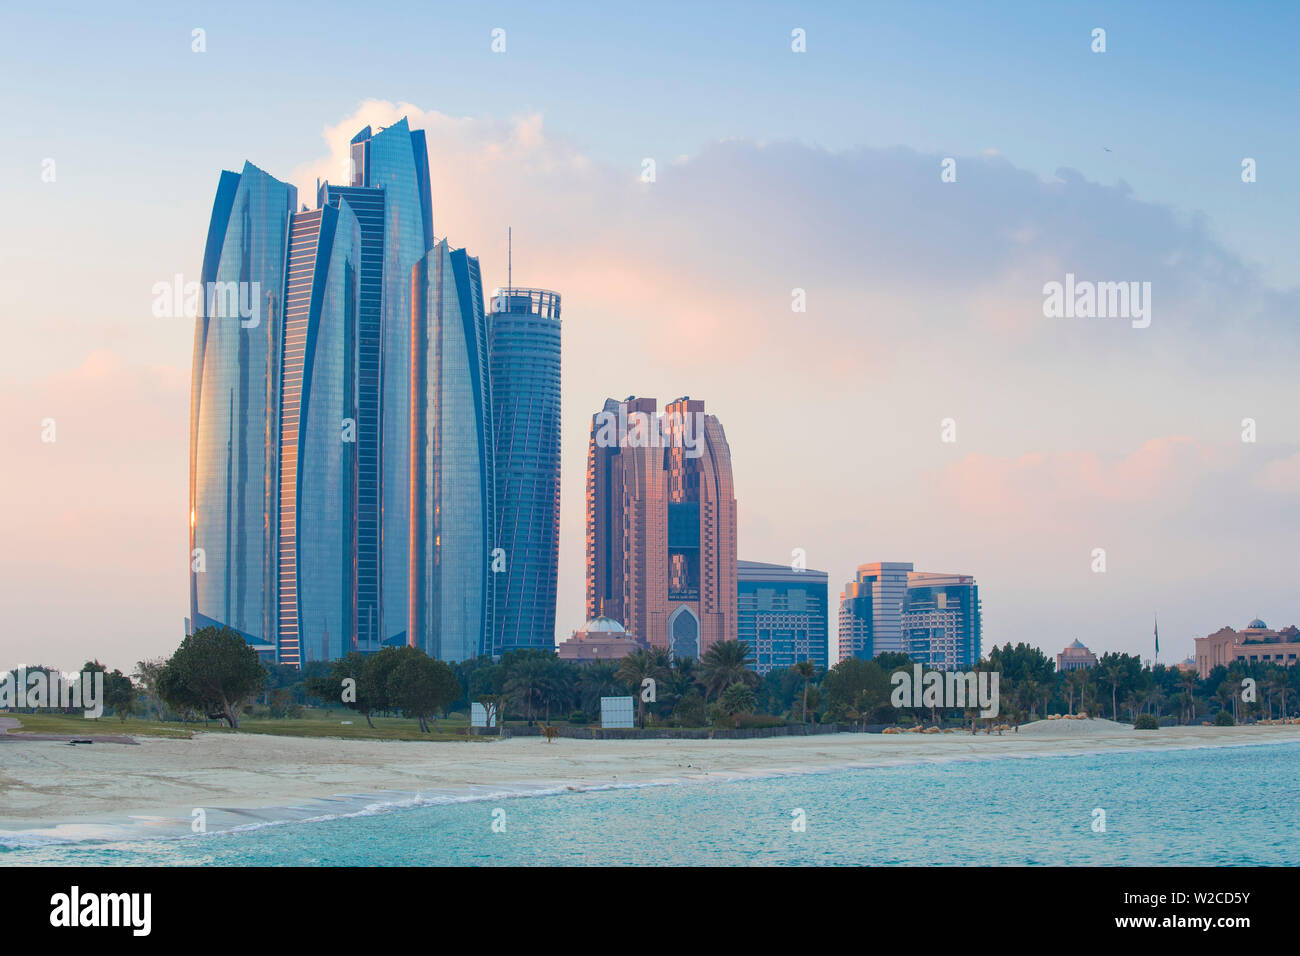 United Arab Emirates, Abu Dhabi, View of Etihad Towers, Grand Hyatt, and Bab Al Aasr Hotels - Stock Image